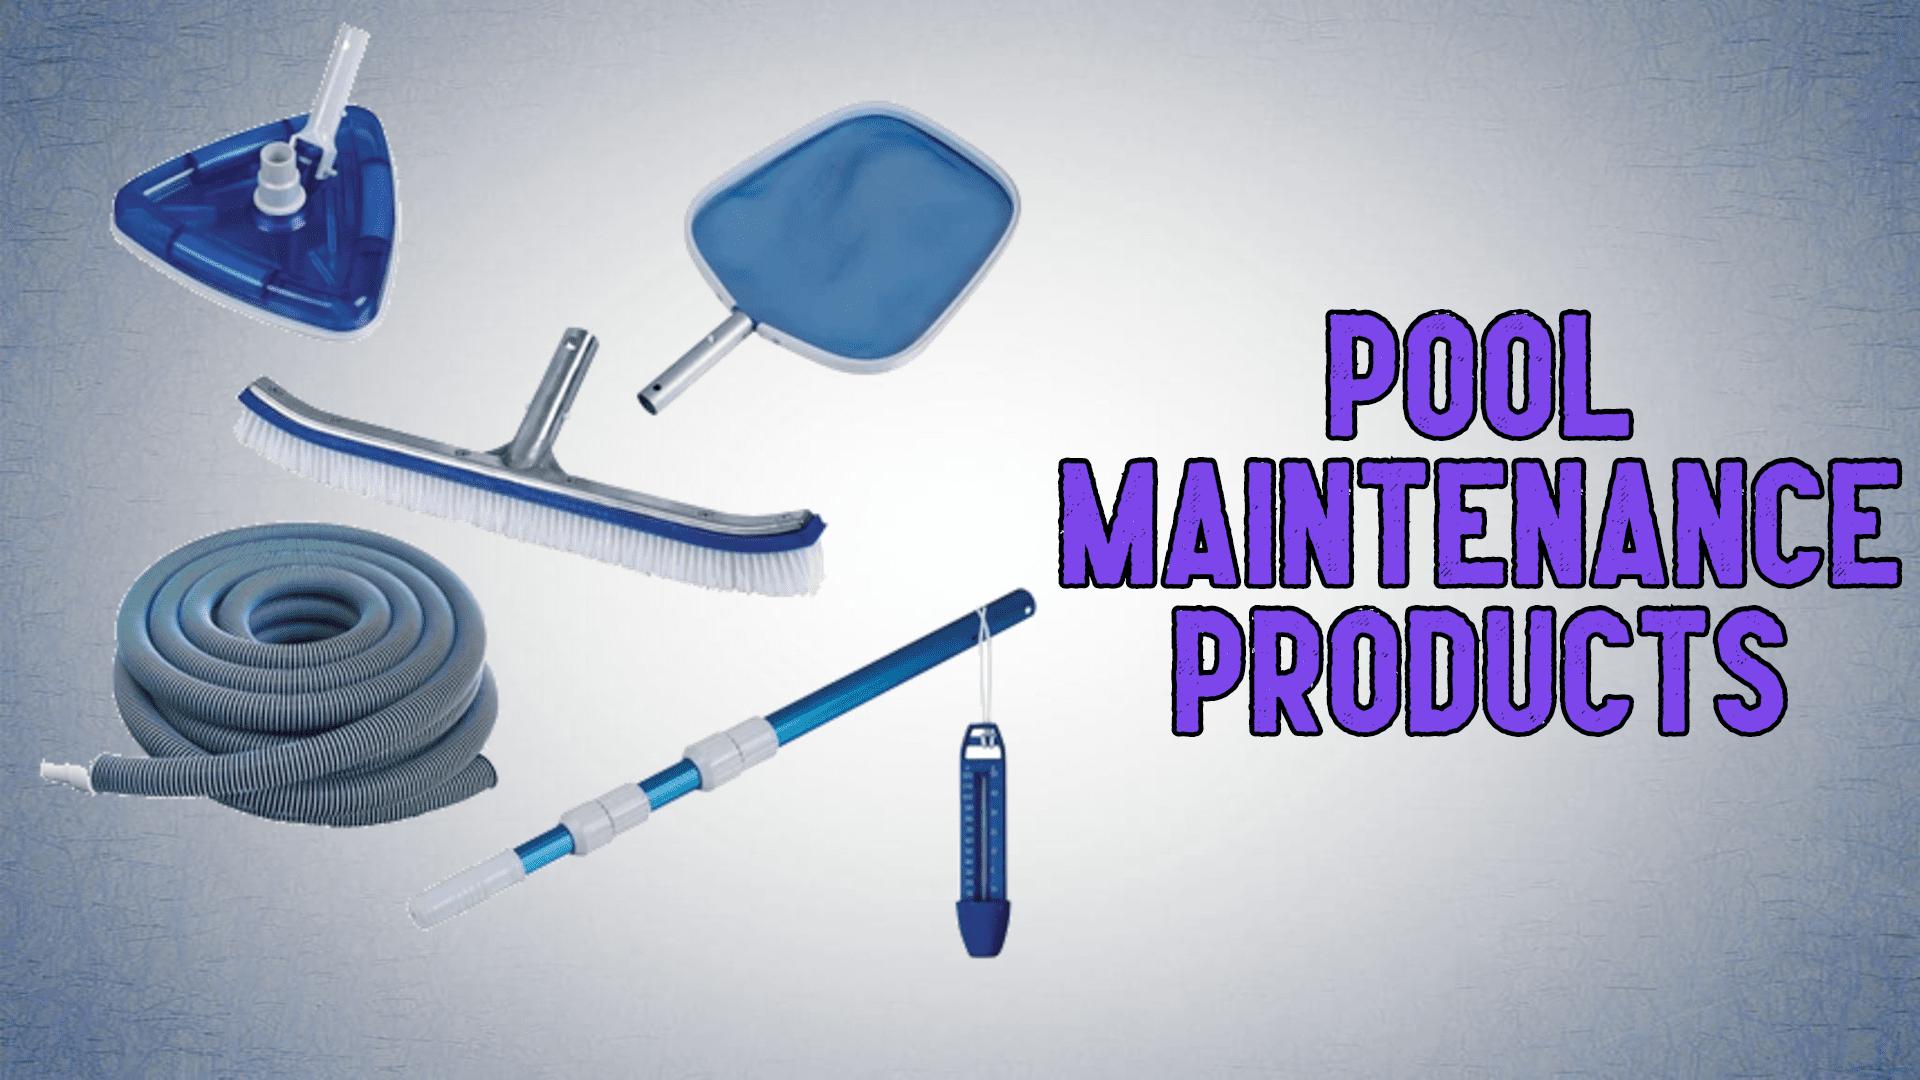 PoolMaintenanceProducts